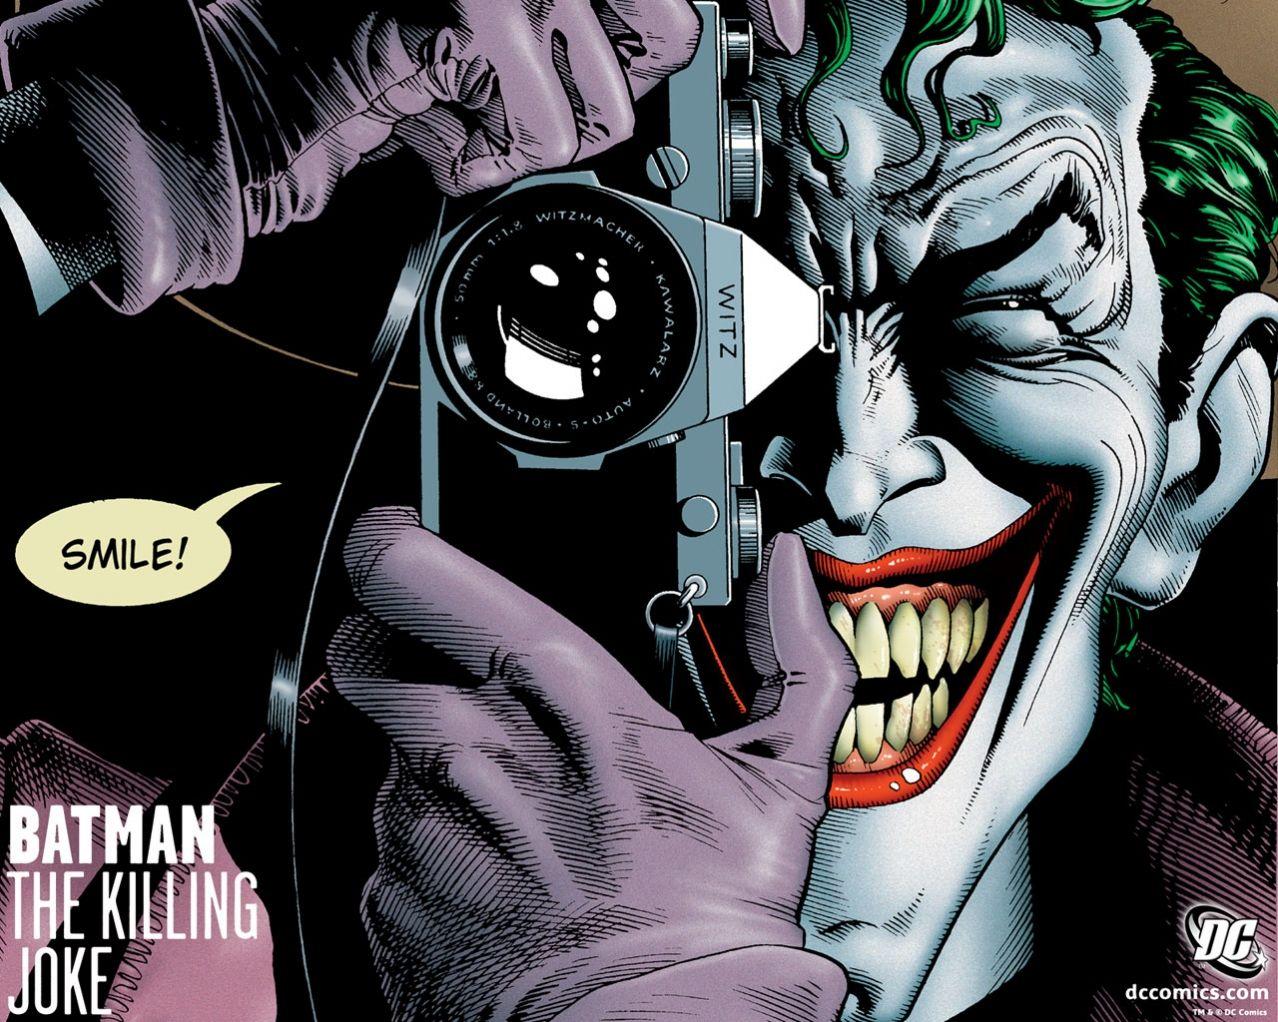 Joker Camera Click Hd Wallpapers Best Hd Wallpapers Joker Comic Joker Wallpapers Joker Animated